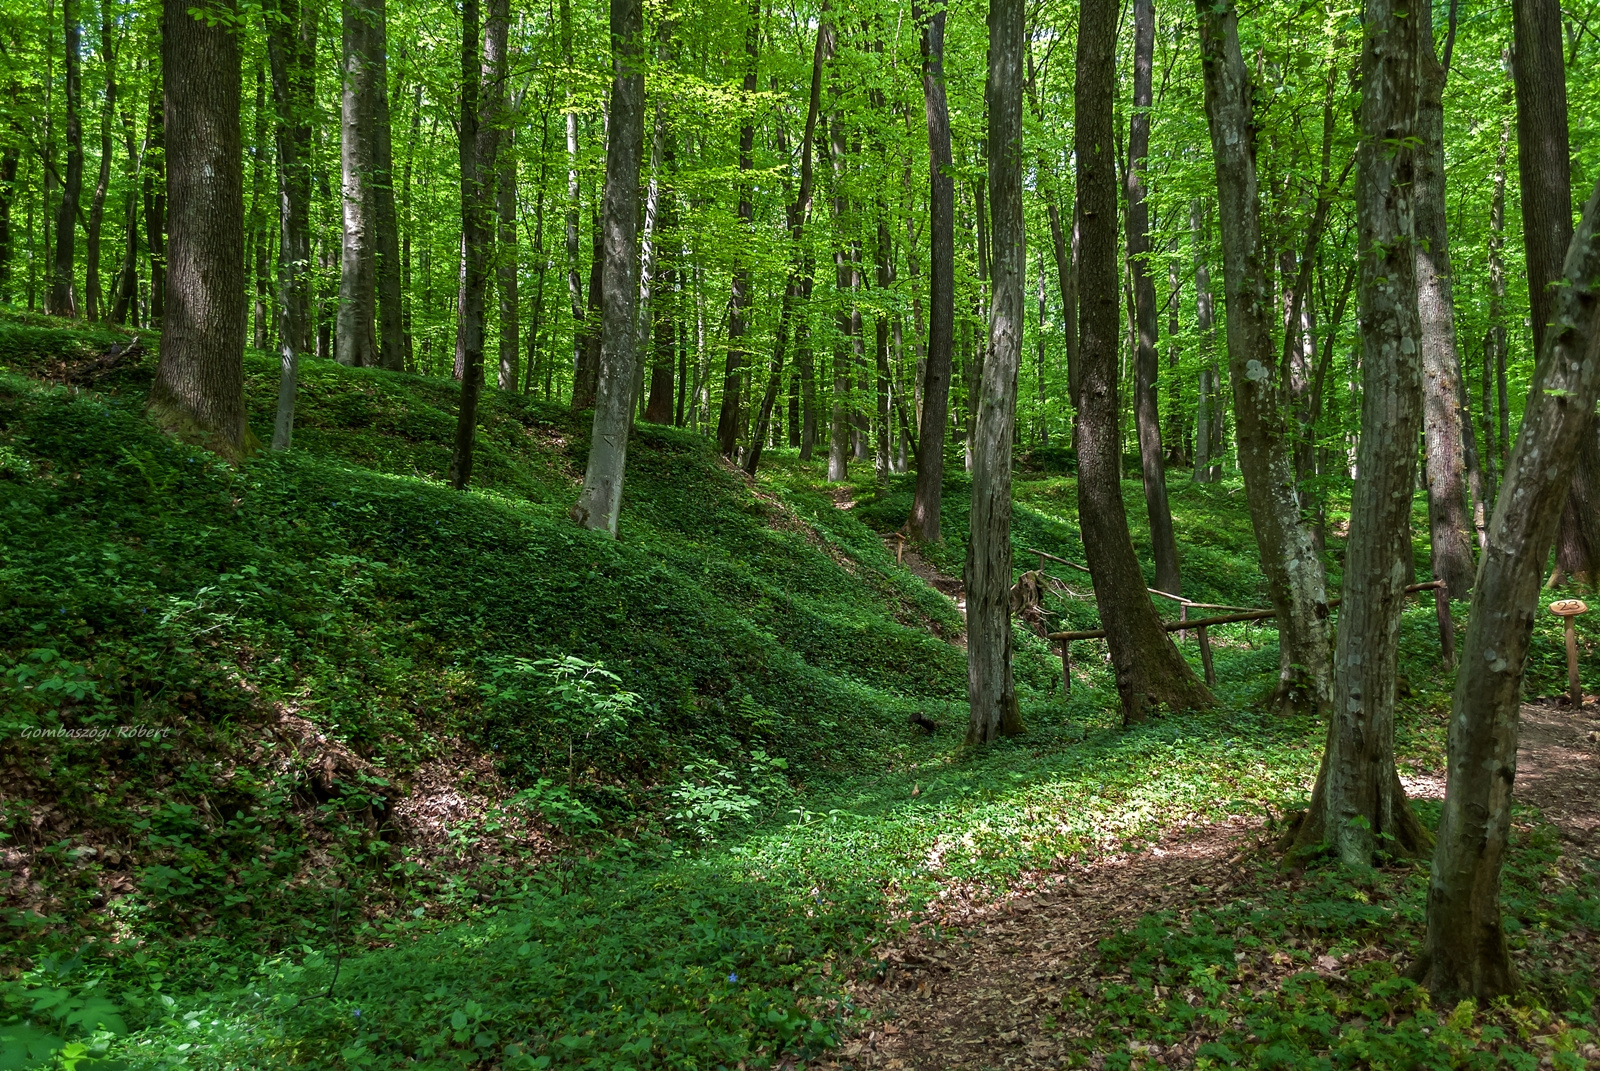 Erdőben